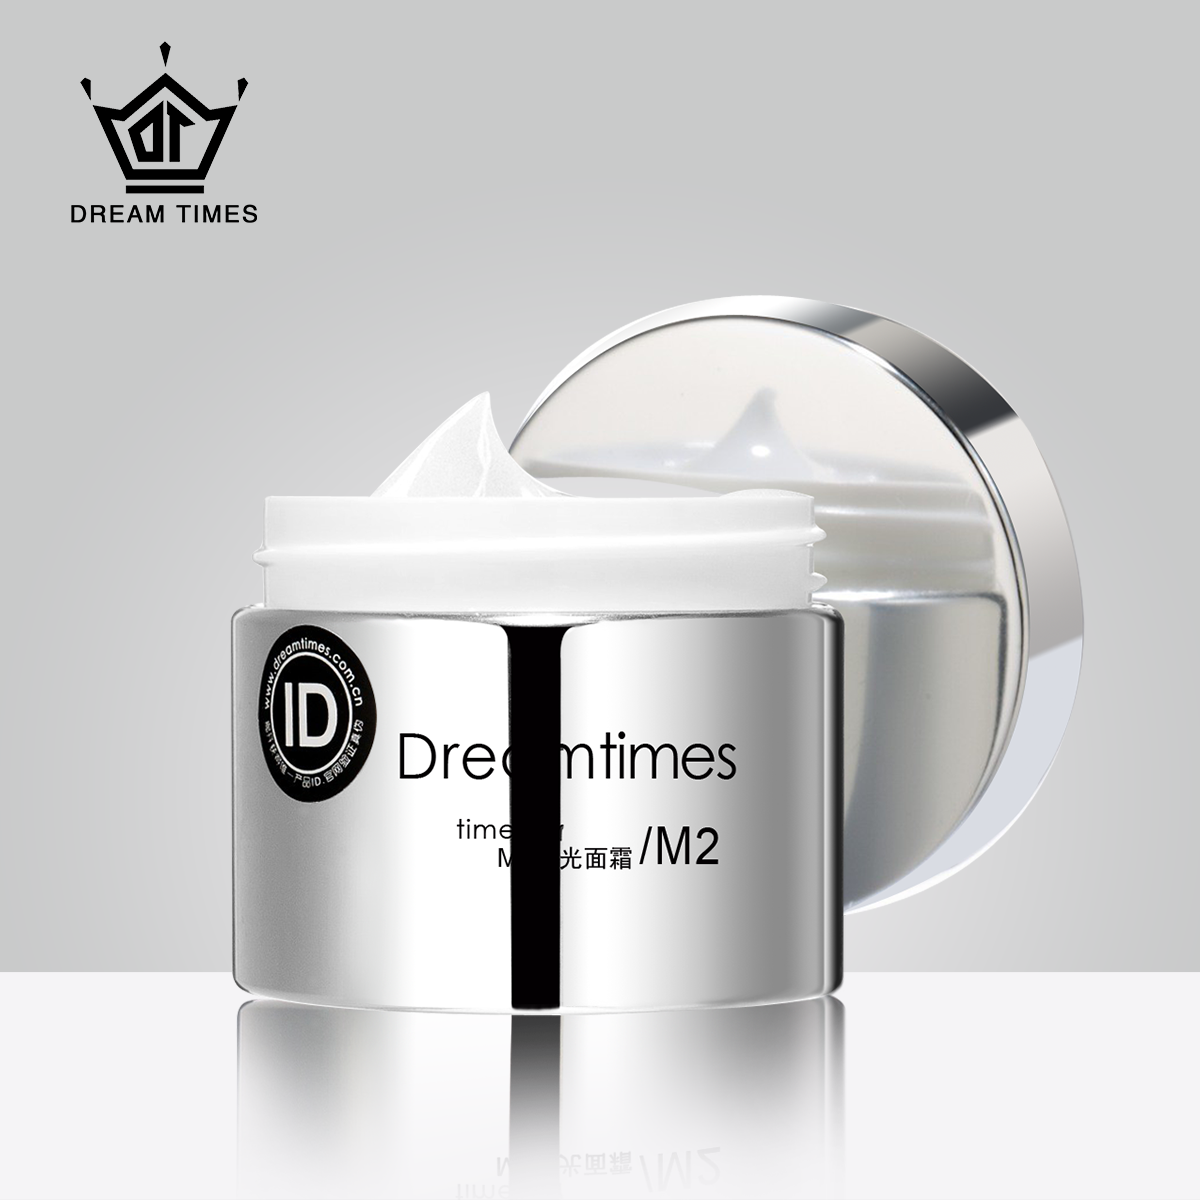 Dreamtimes M2时光面霜干性肌肤补水保湿改善肤色暗沉水油平衡